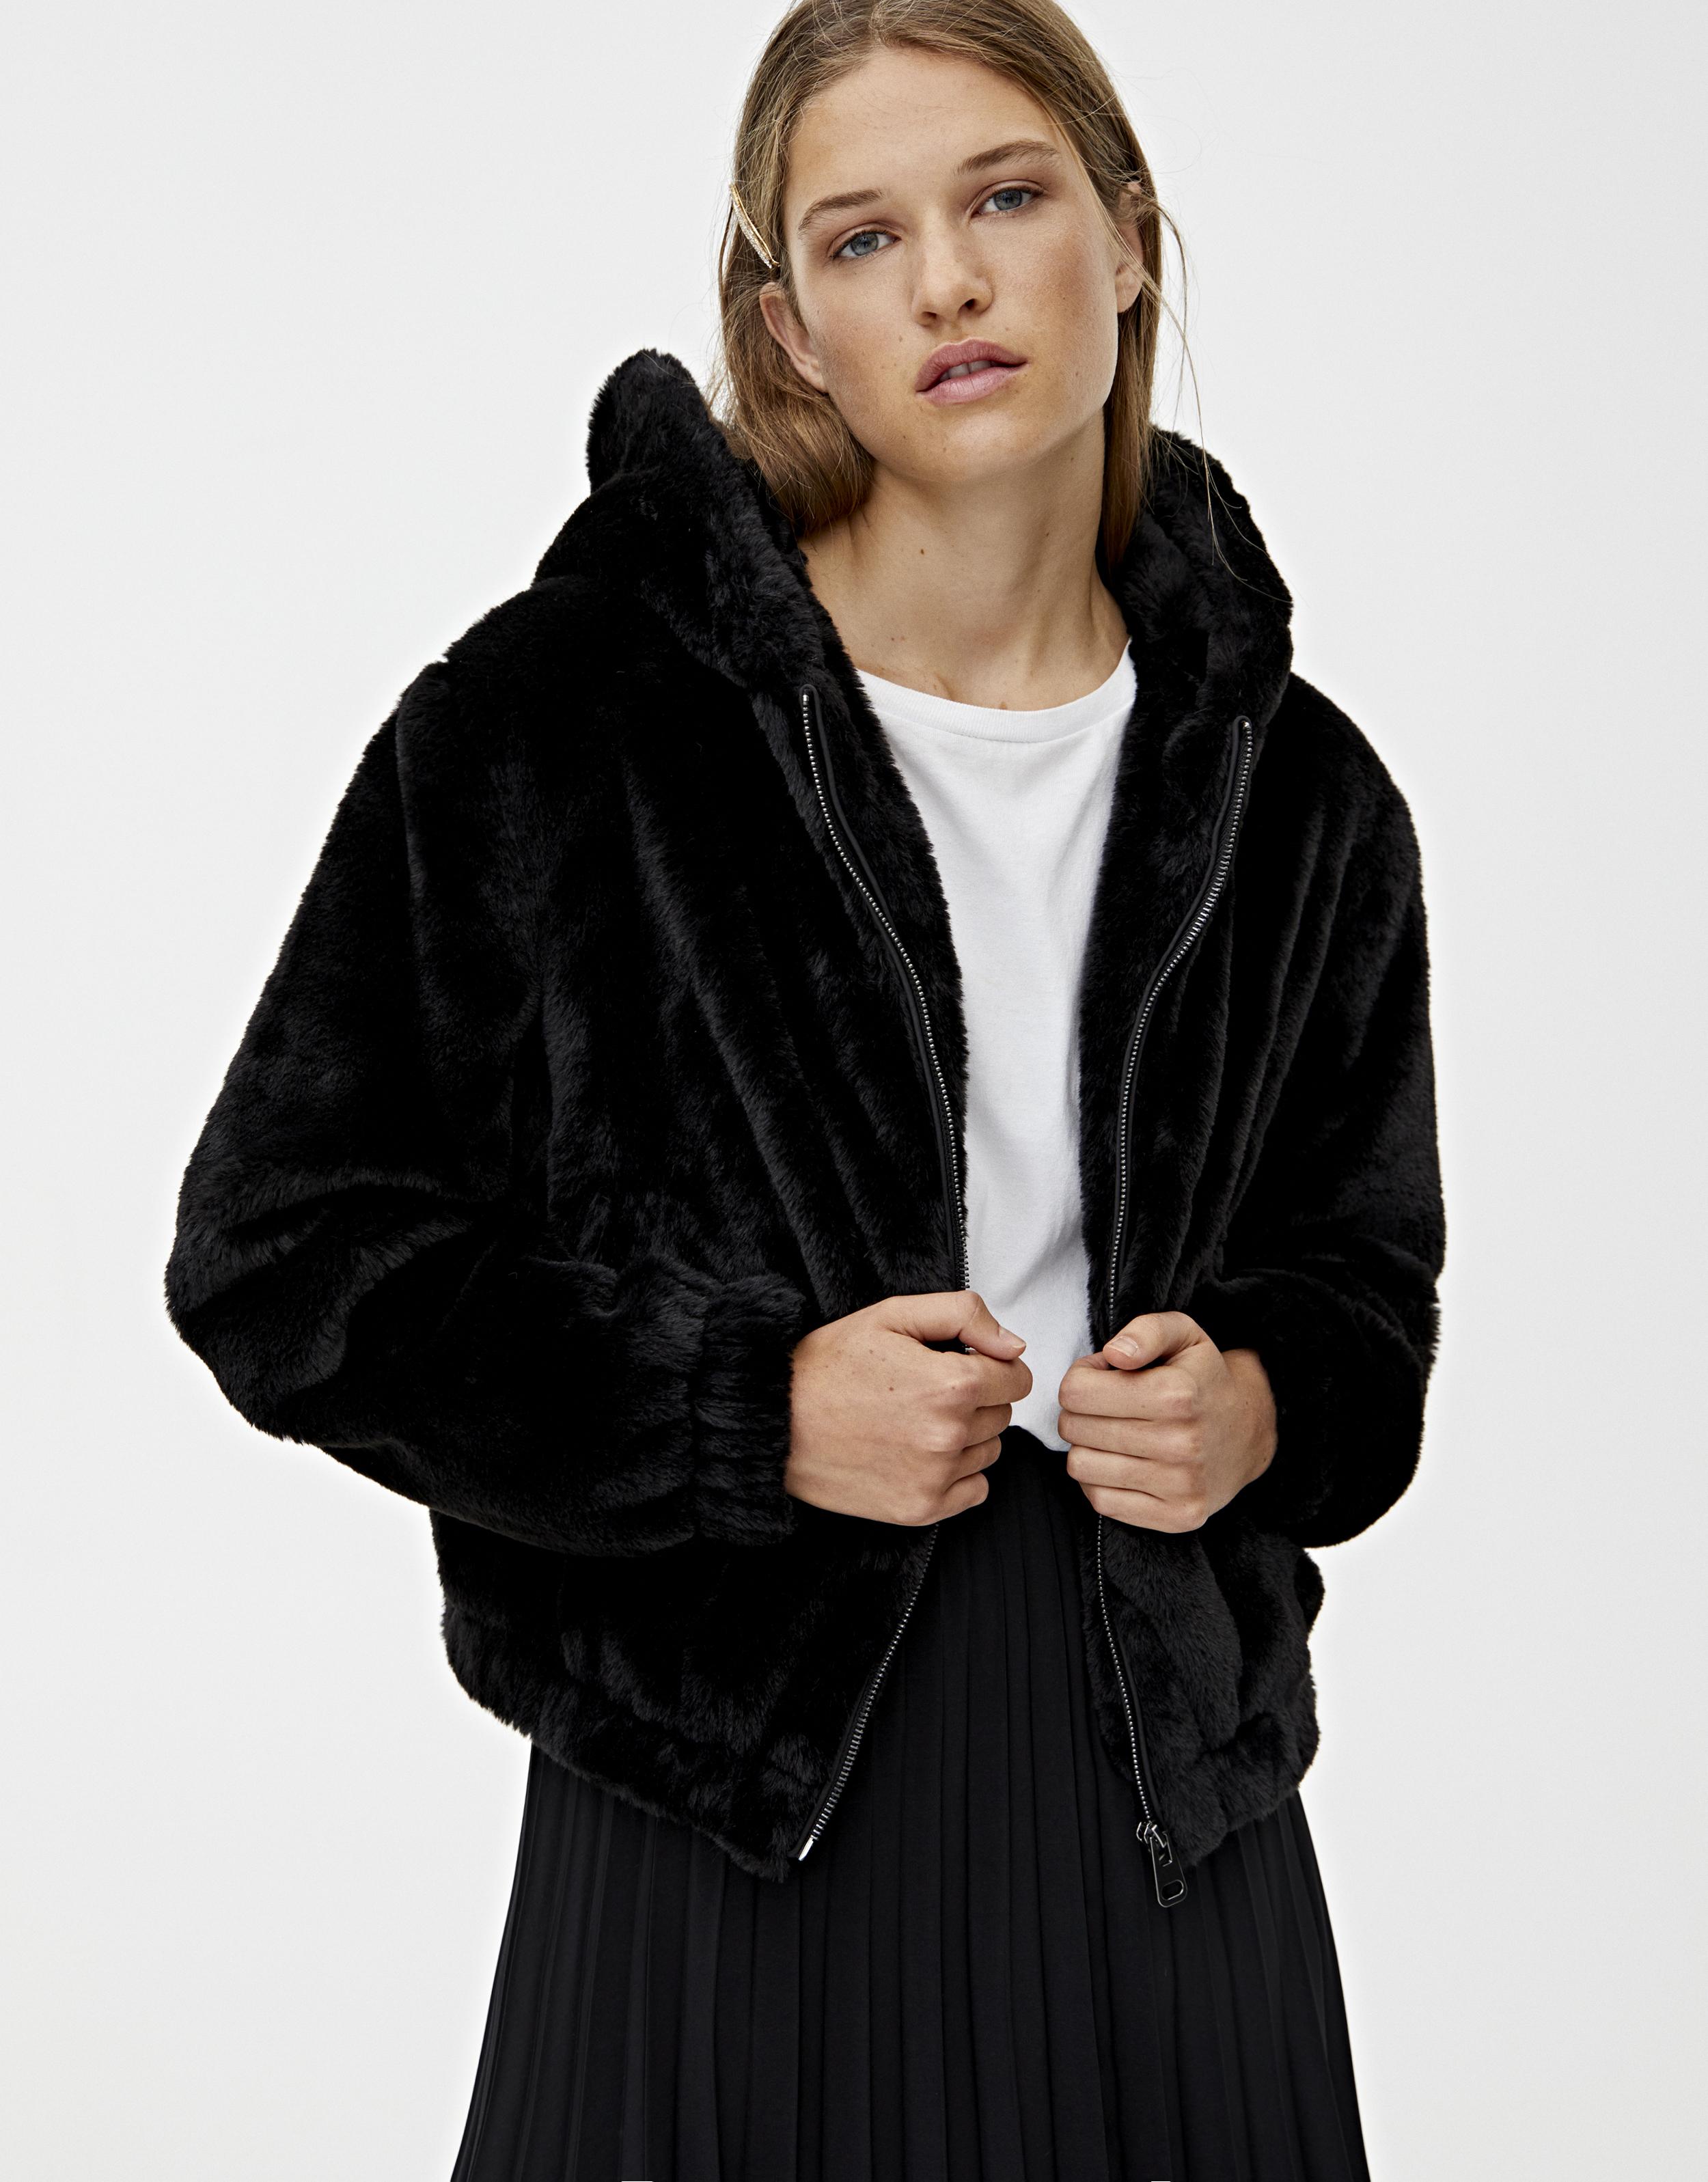 Veste cuir femme agneau noir